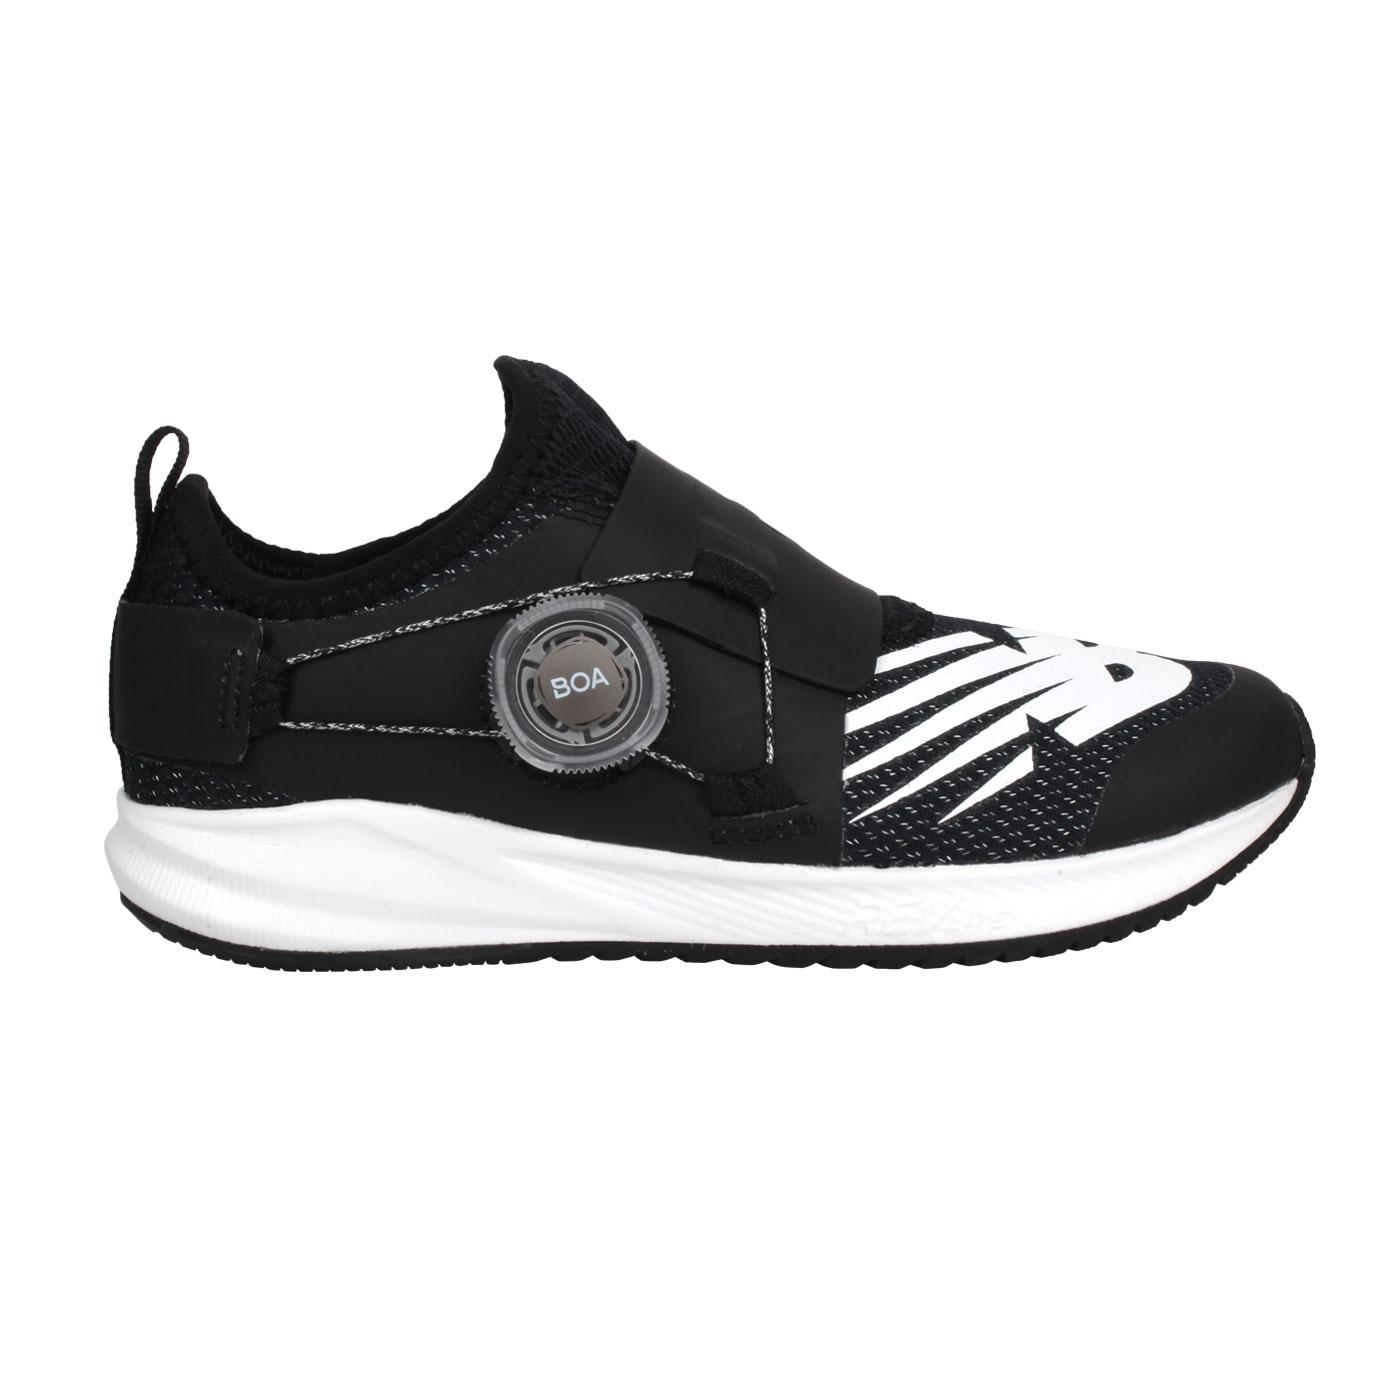 NEW BALANCE 中童旋鈕慢跑鞋-WIDE PKRVLCT2 - 黑白